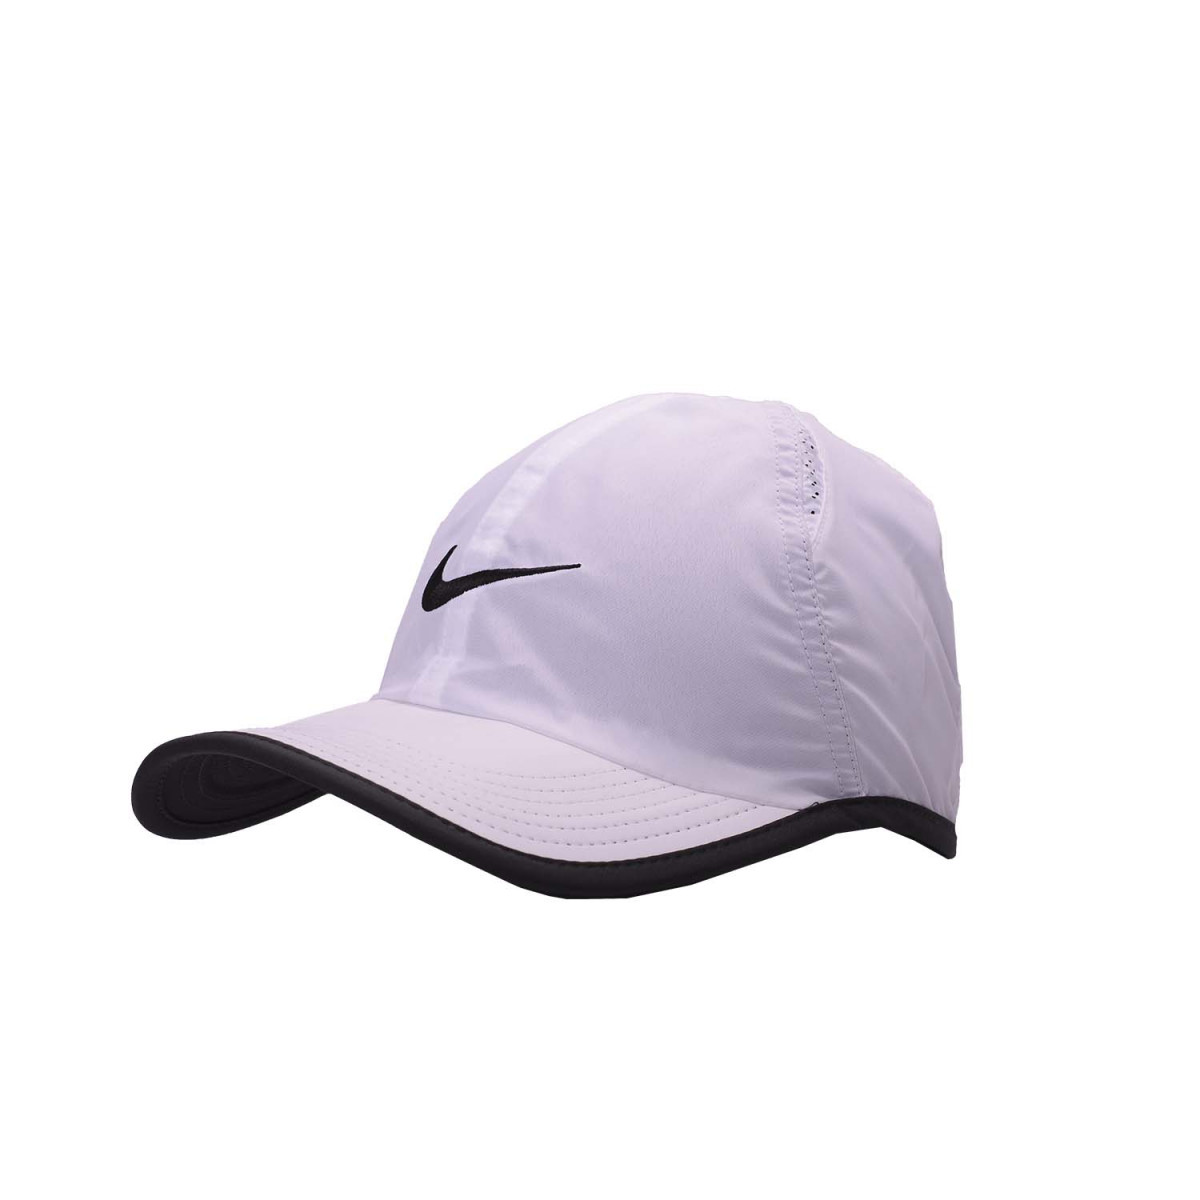 Gorra Nike Feather Light 2.0 - Accesorios - Oferta 9e489793711